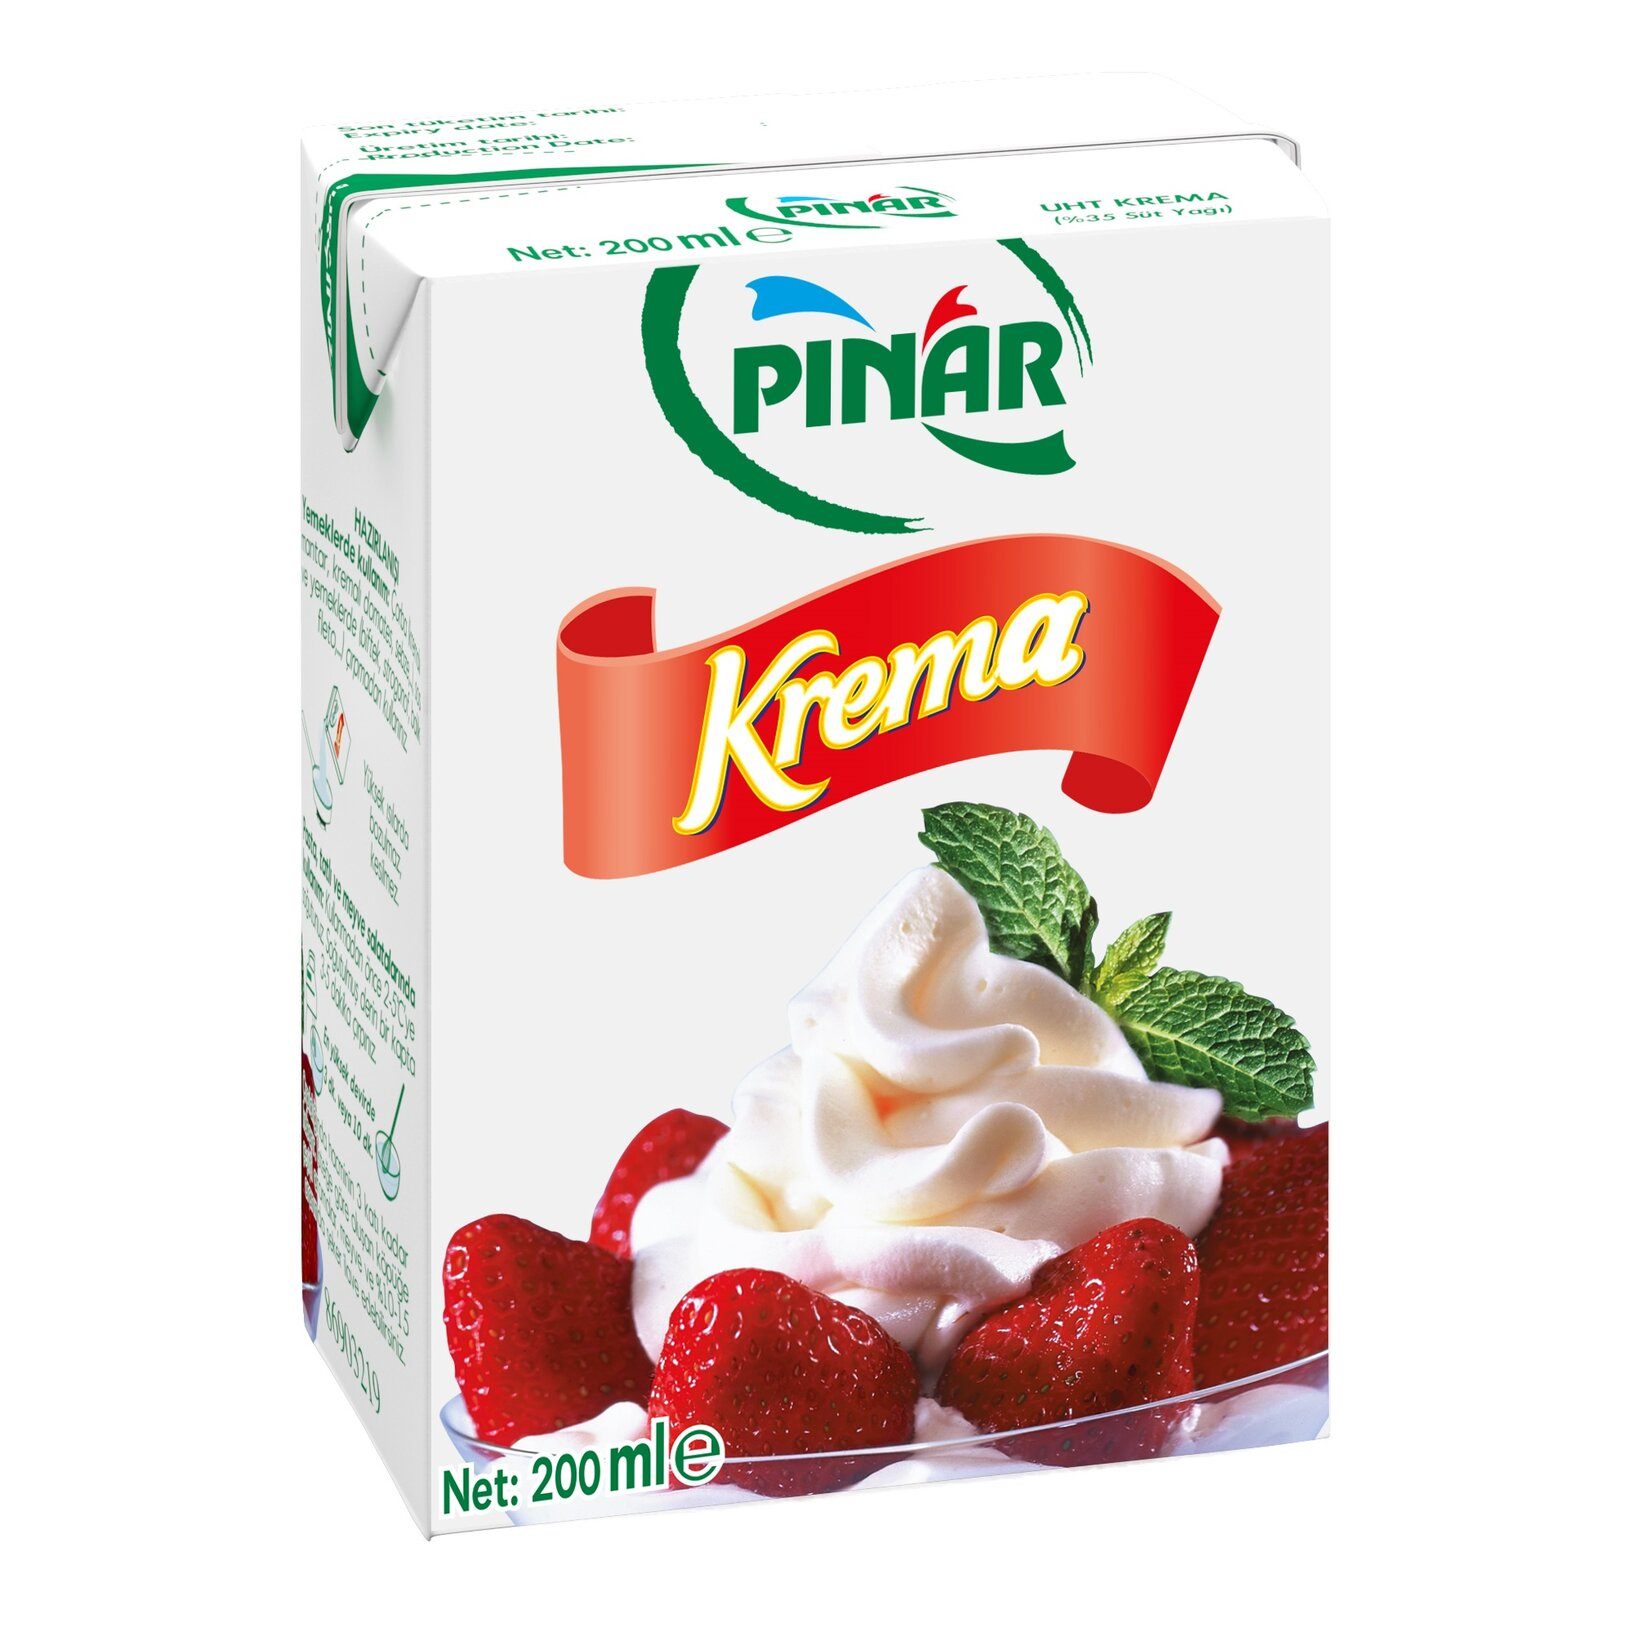 PINAR KREMA 200ML